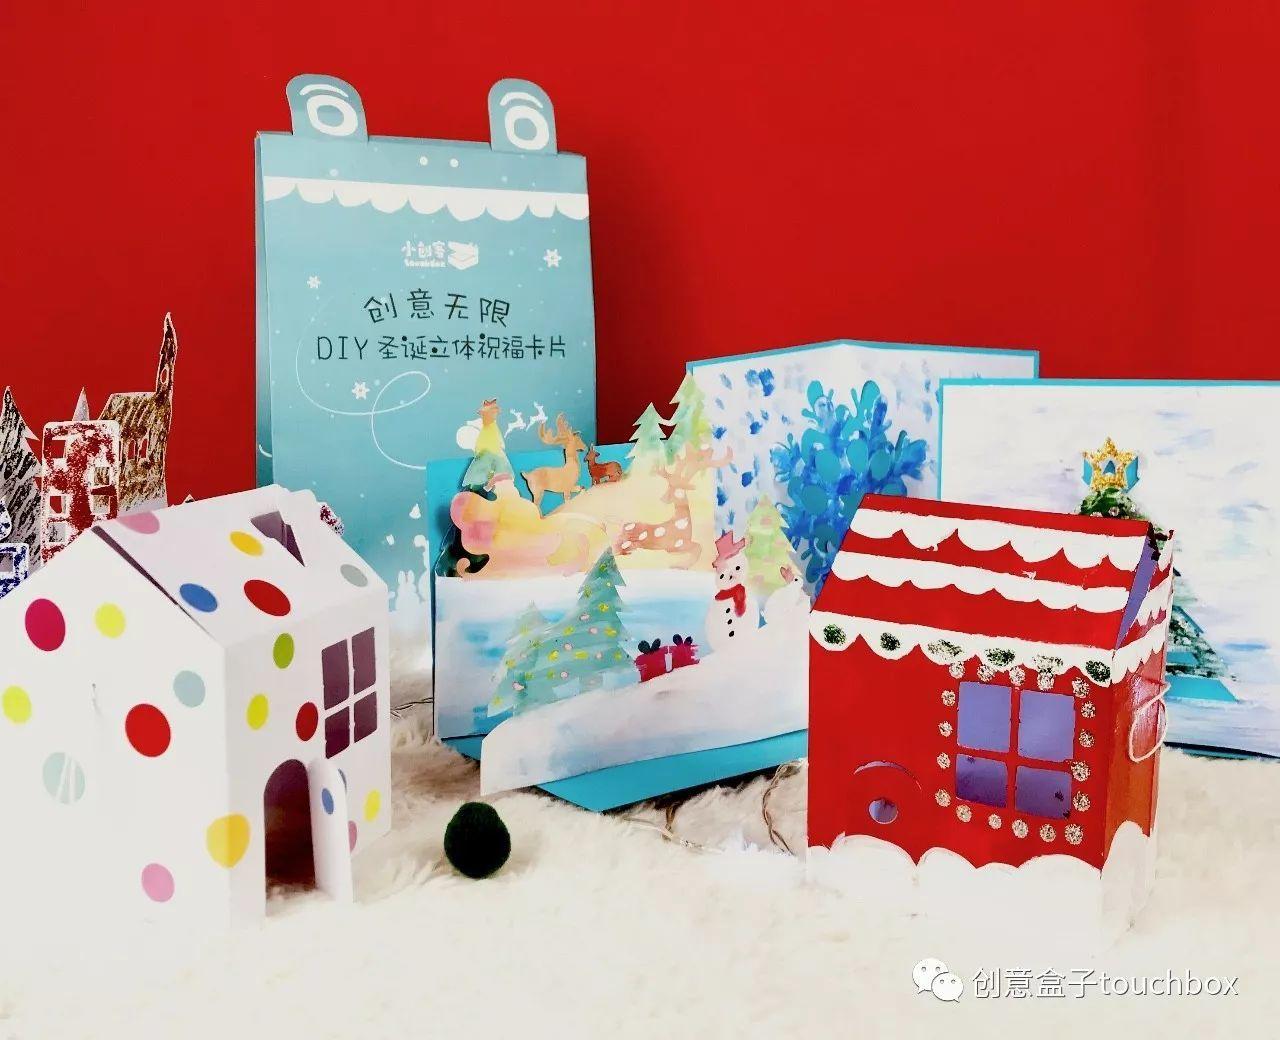 diy圣诞立体祝福卡片